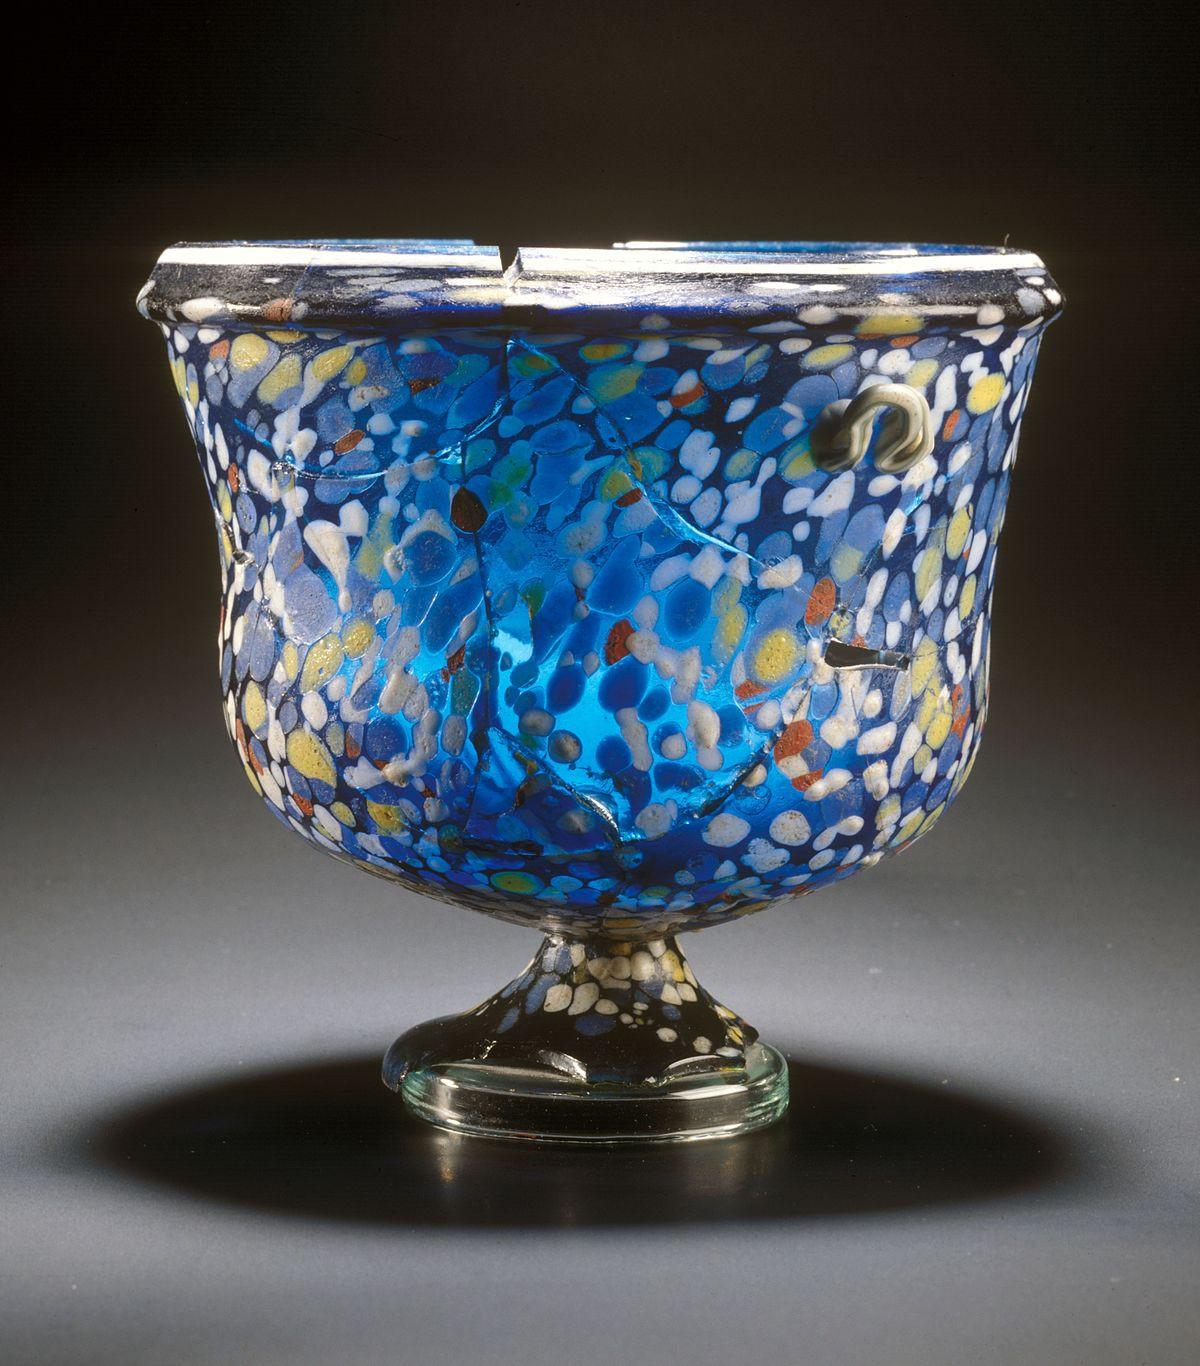 30 Famous Donate Glass Flower Vases 2021 free download donate glass flower vases of glass art wikipedia in 1200px emona trgovina in obrt 1a